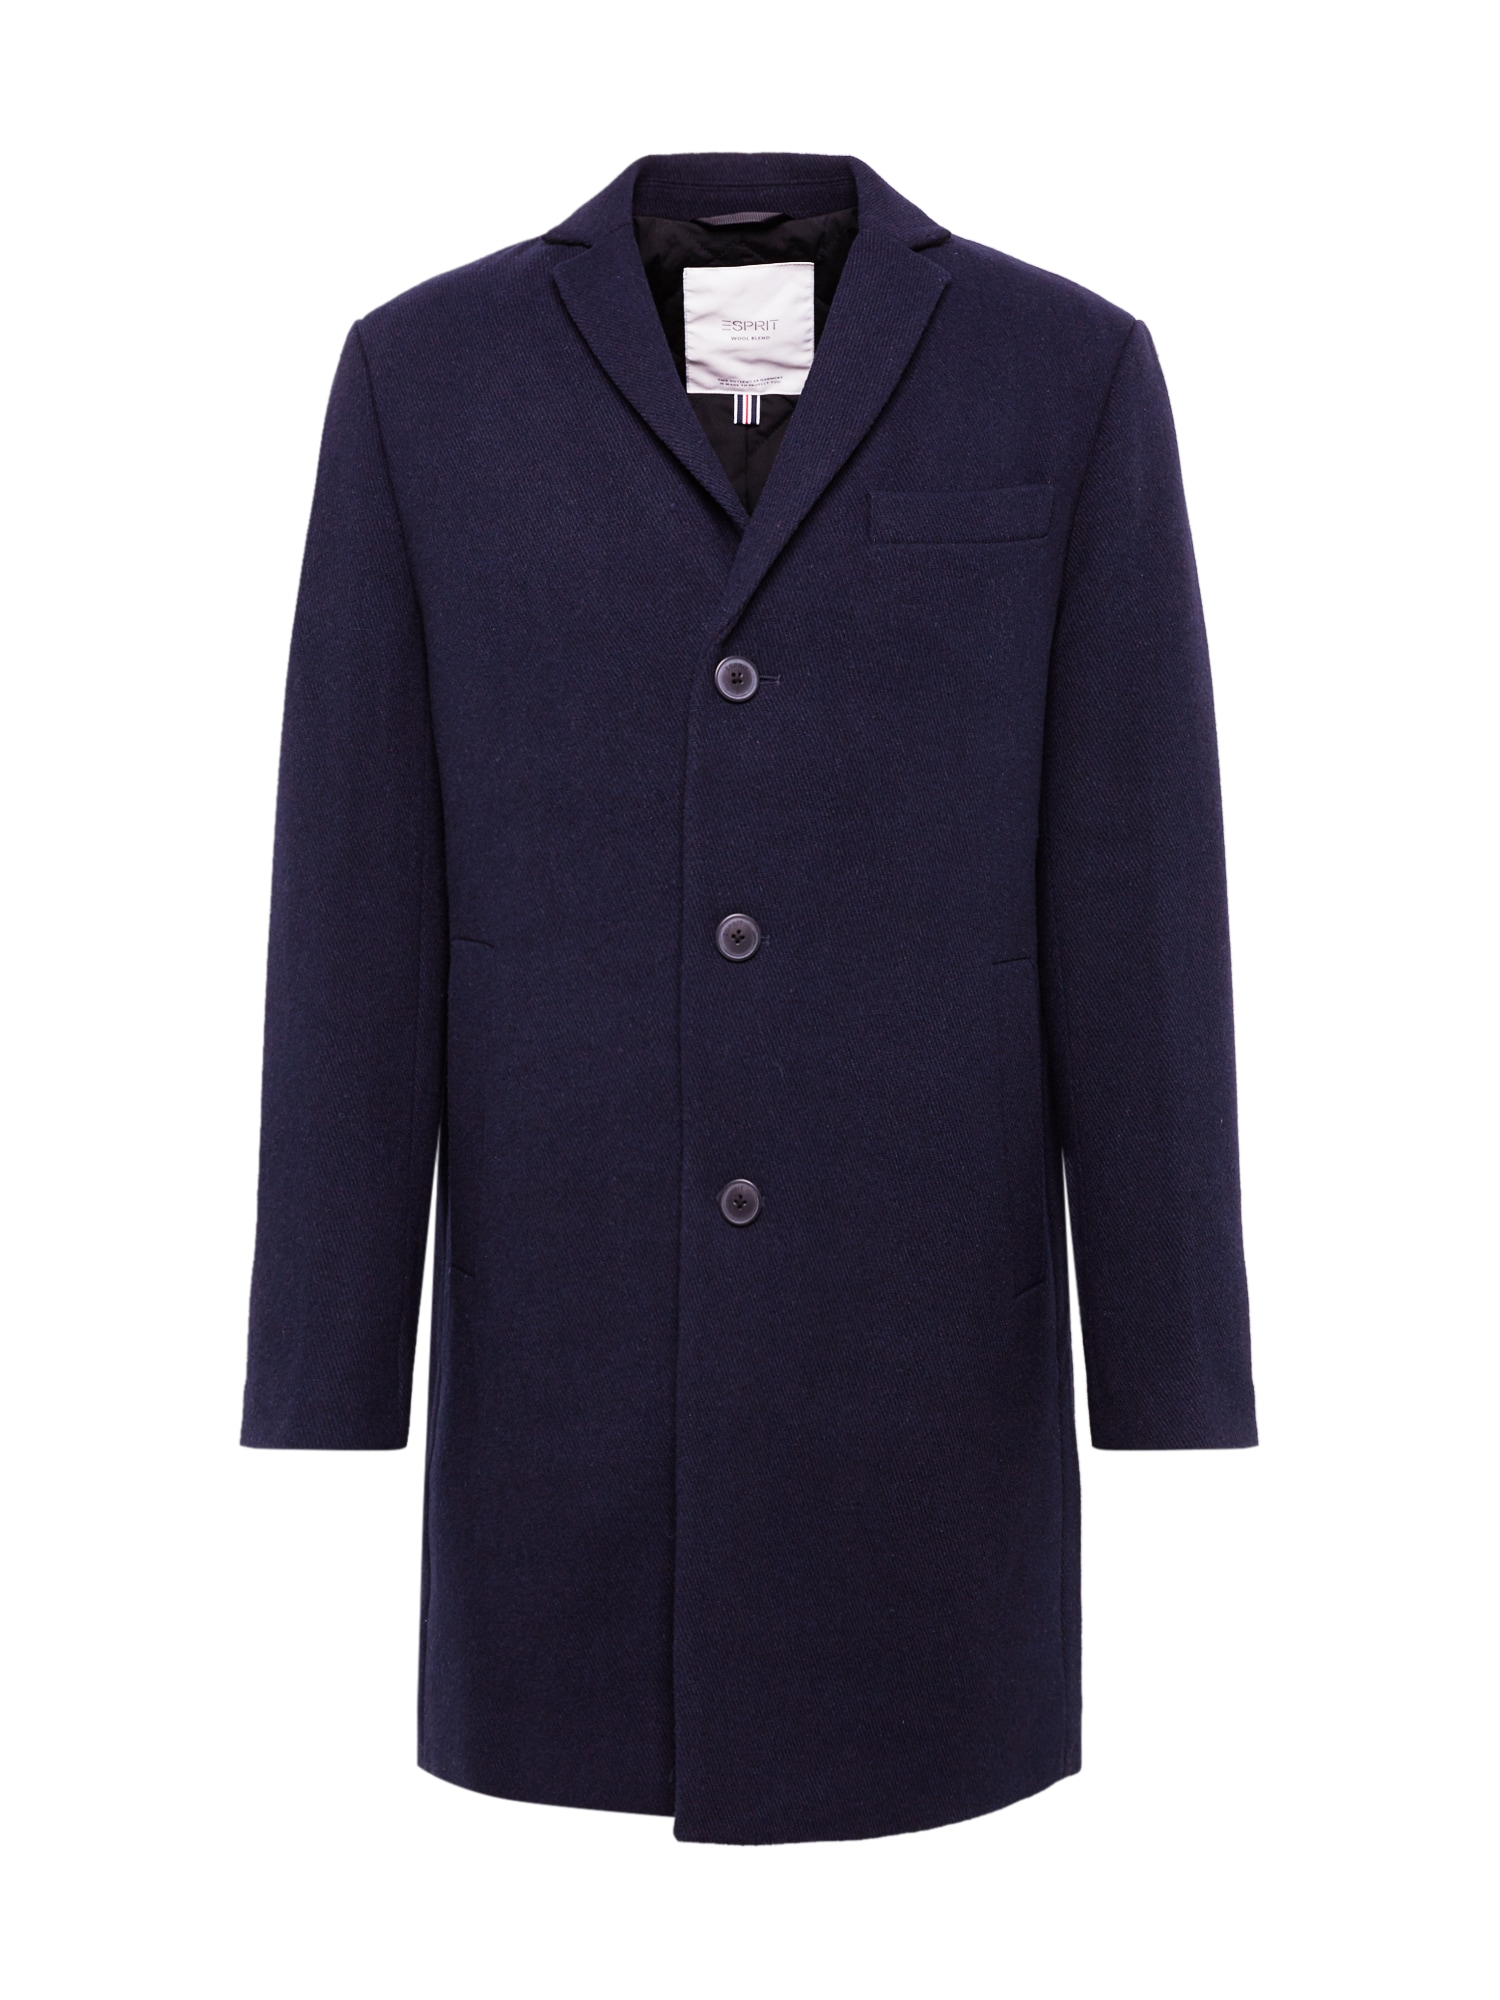 ESPRIT Rudeninis-žieminis paltas 'Twill blz coat*' tamsiai mėlyna